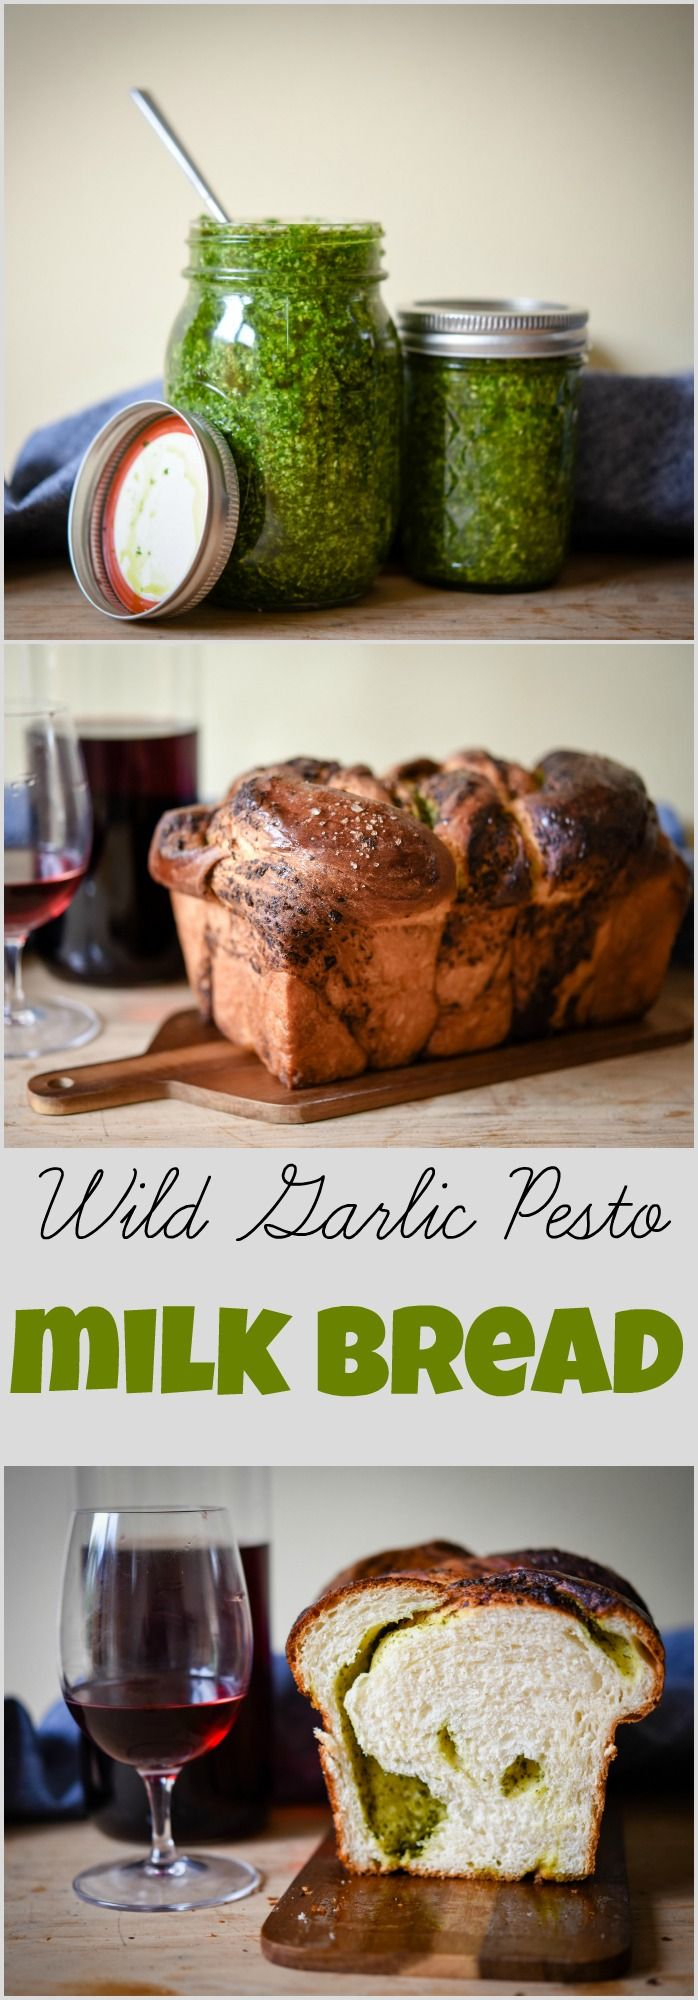 Wild Garlic Pesto Milk Bread | Patisserie Makes Perfect